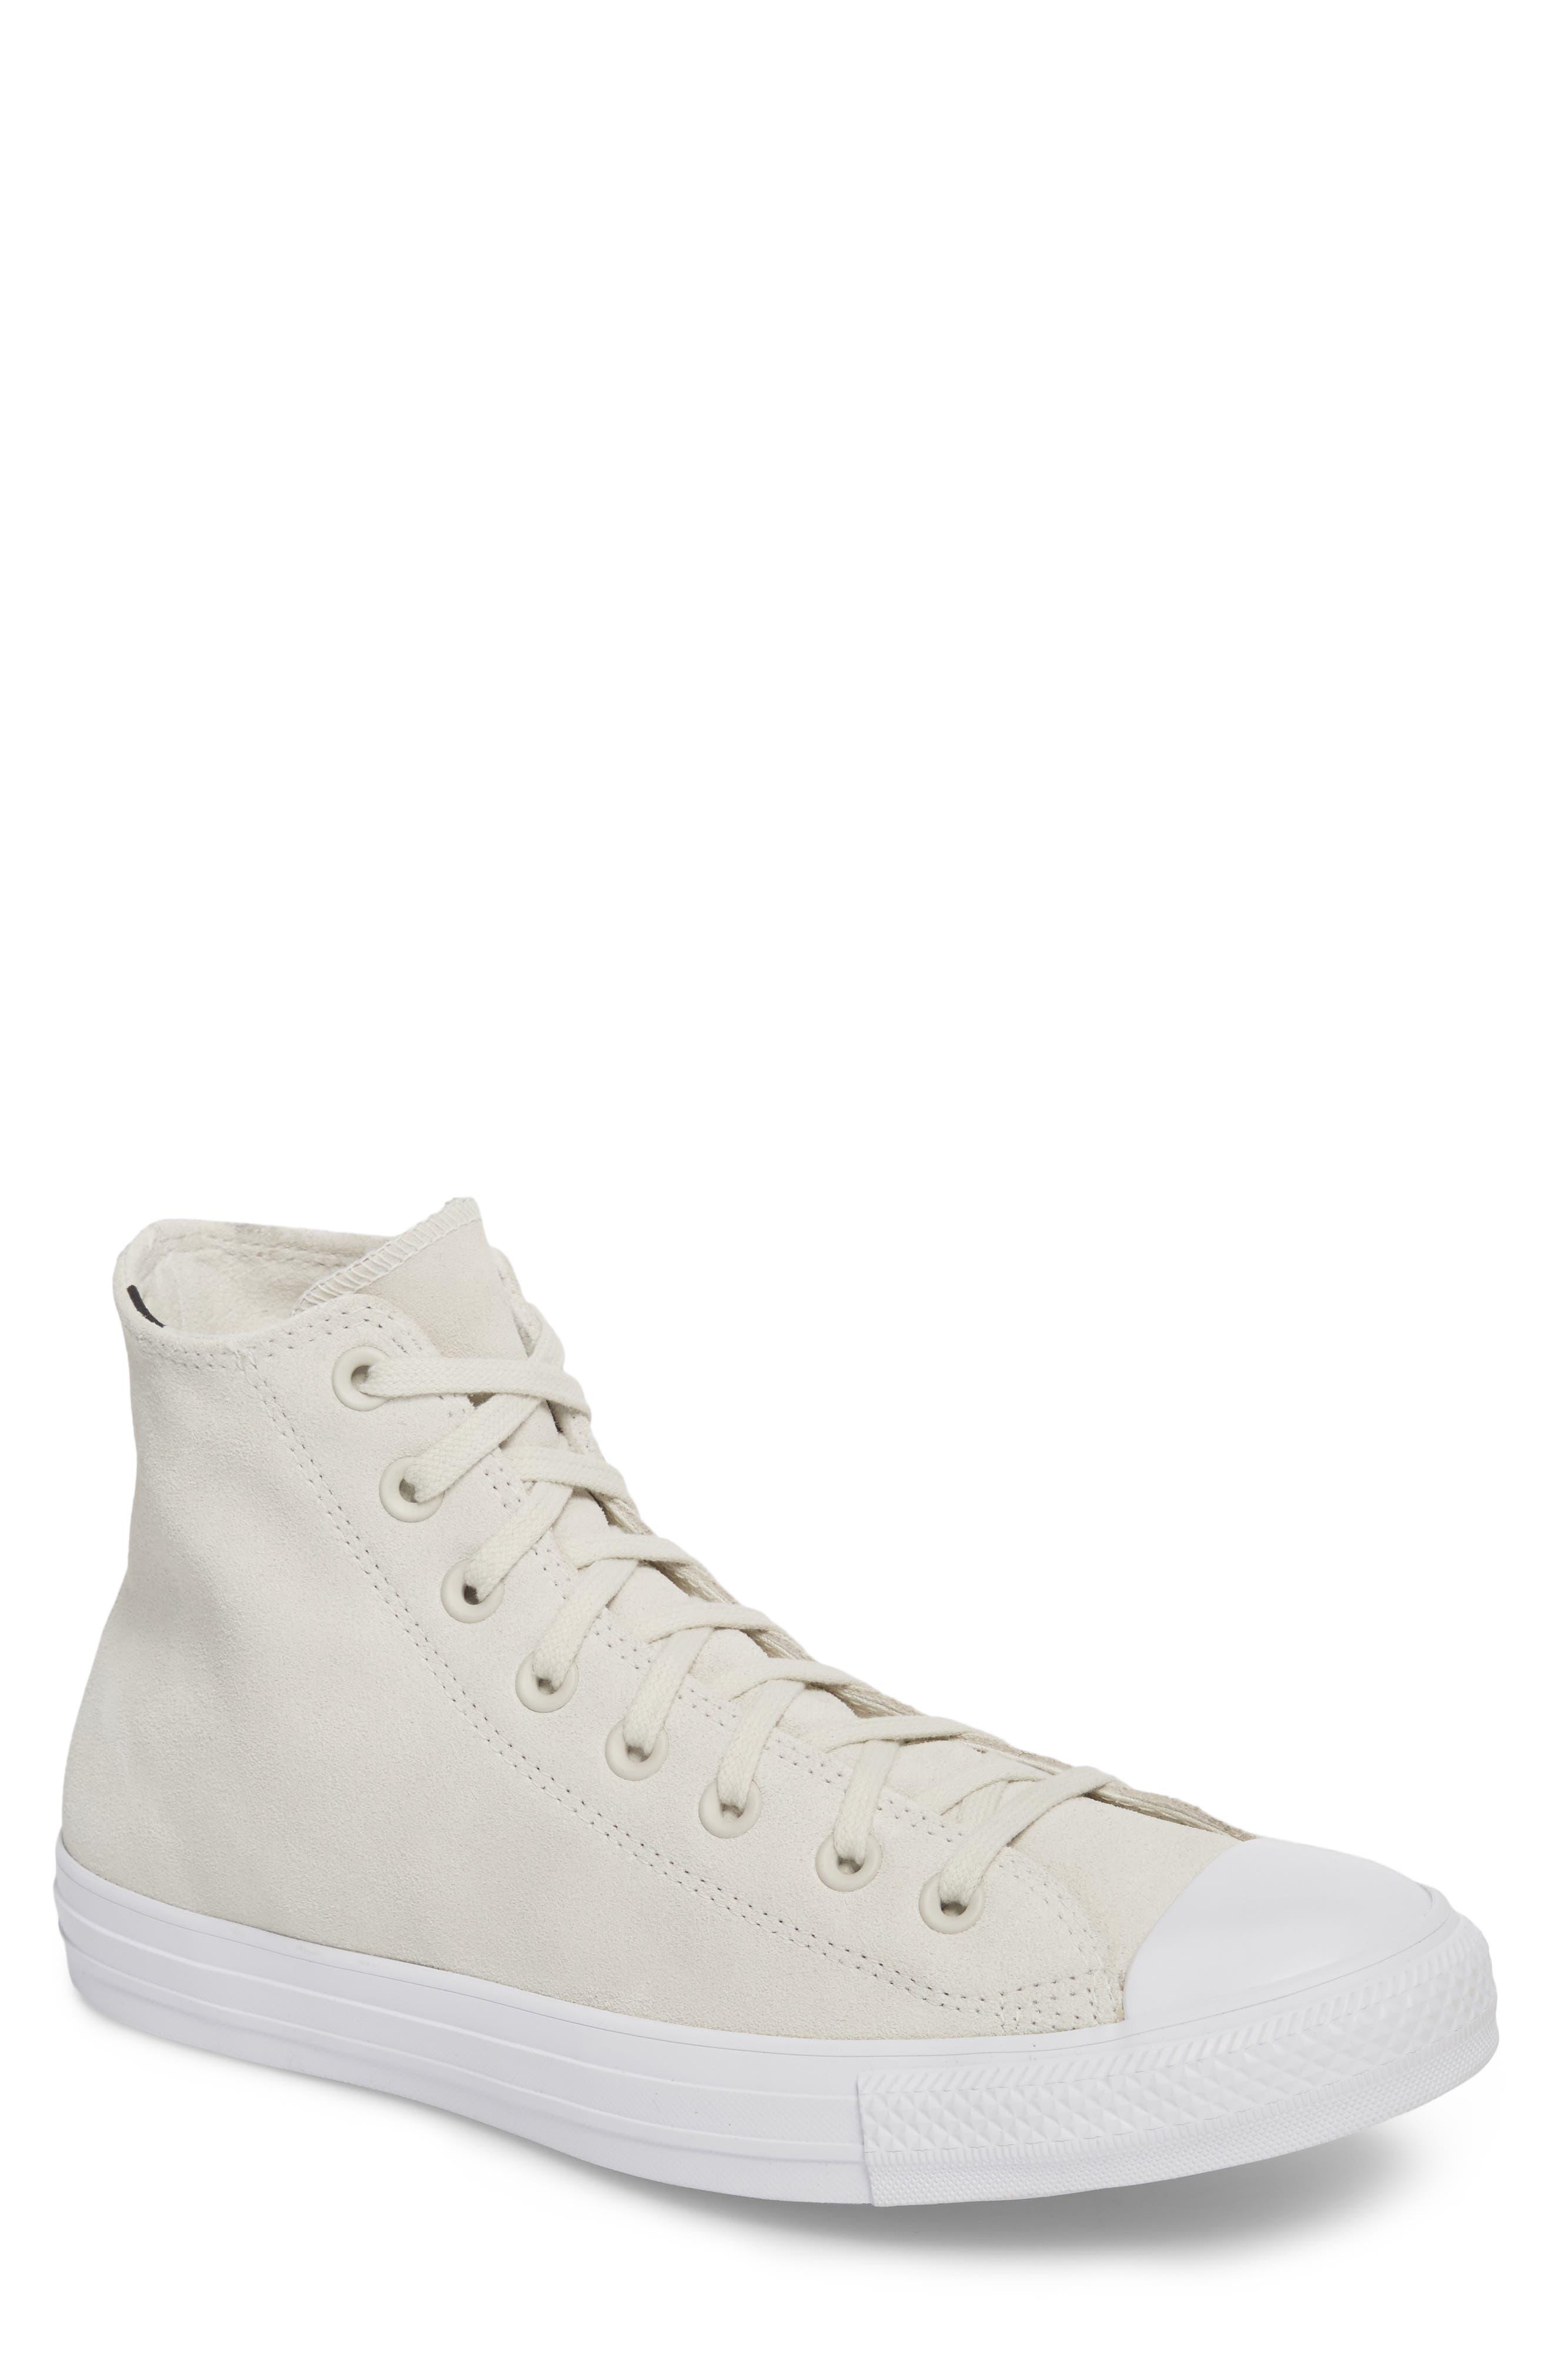 Alternate Image 1 Selected - Converse Chuck Taylor® All Star® Plush Hi Sneaker (Men)